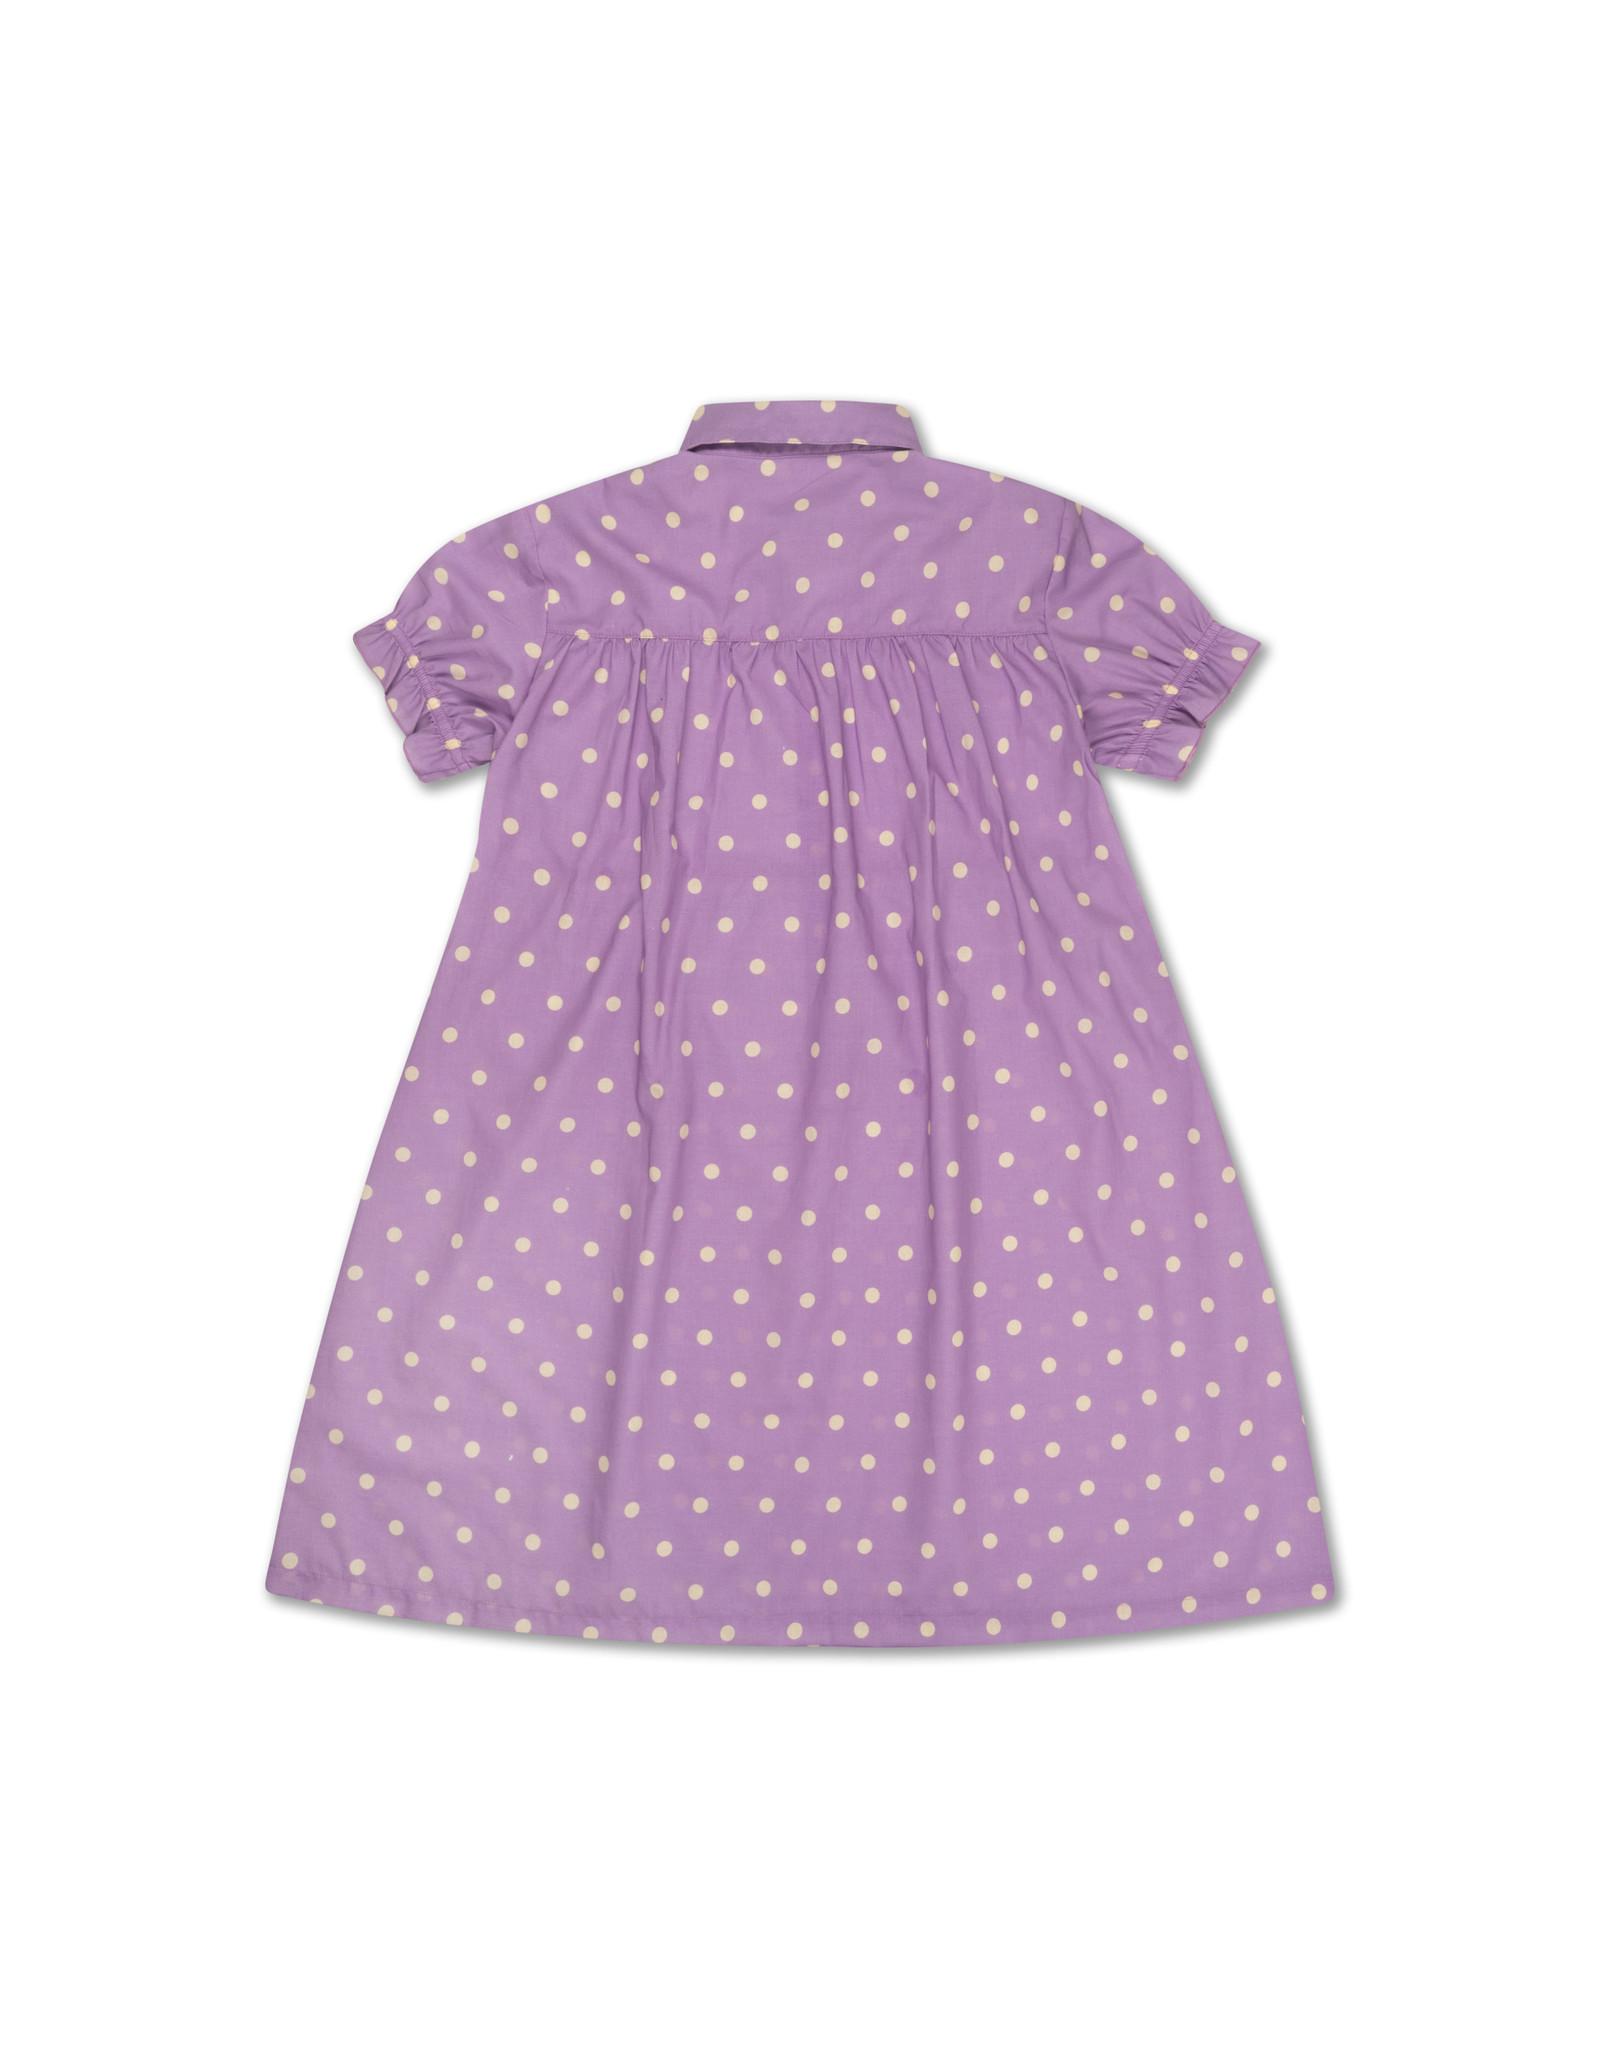 Repose Repose SS21 46 Dreamy dress polka dots violet